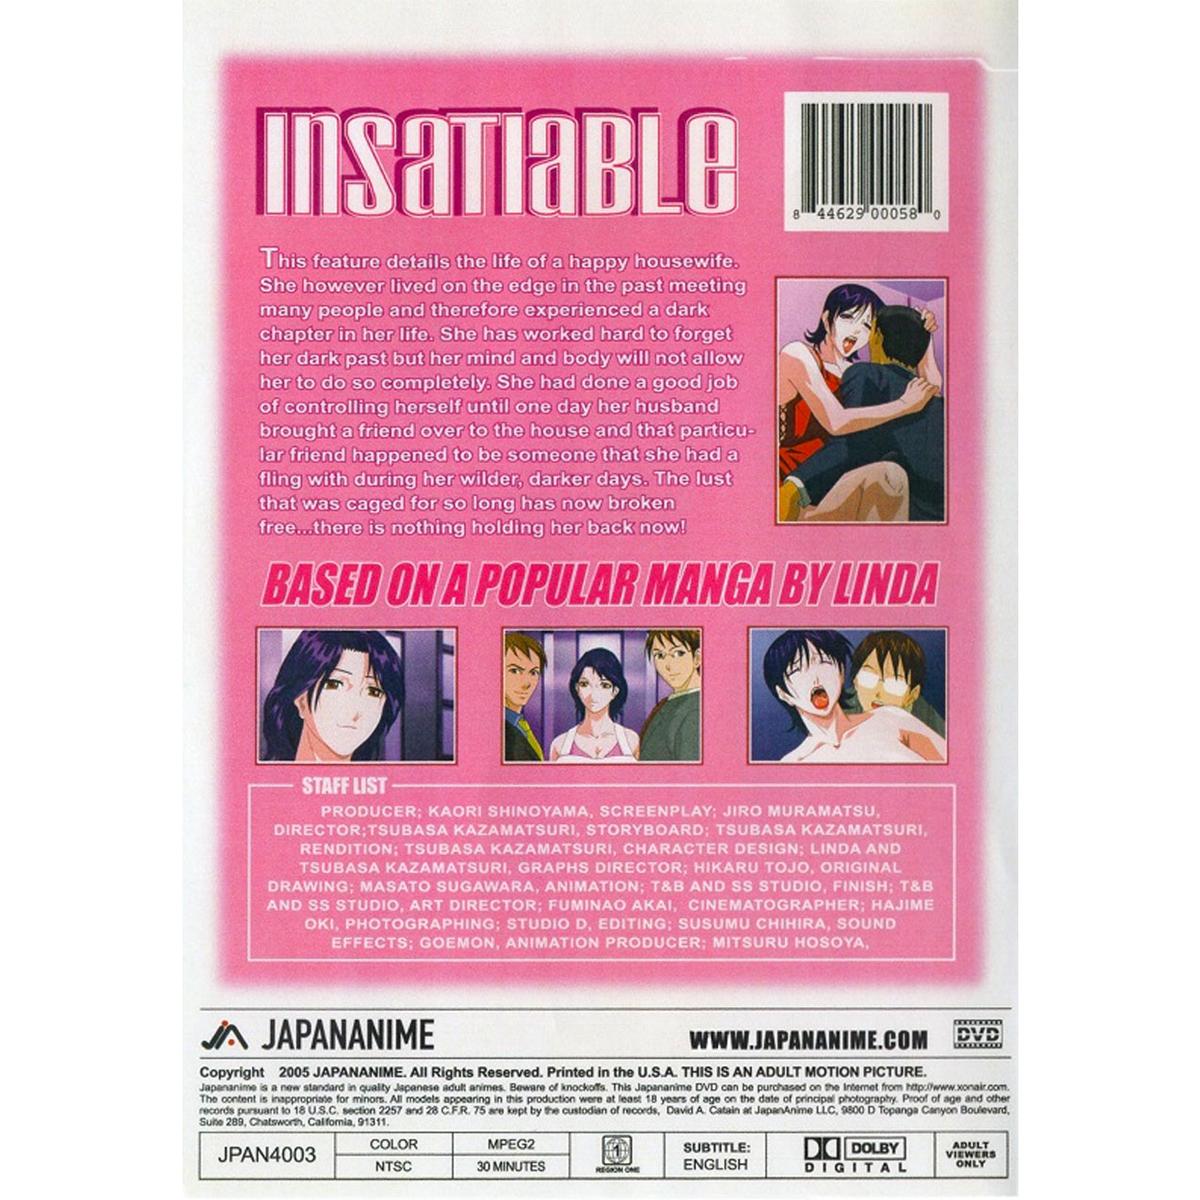 Insatiable DVD 1